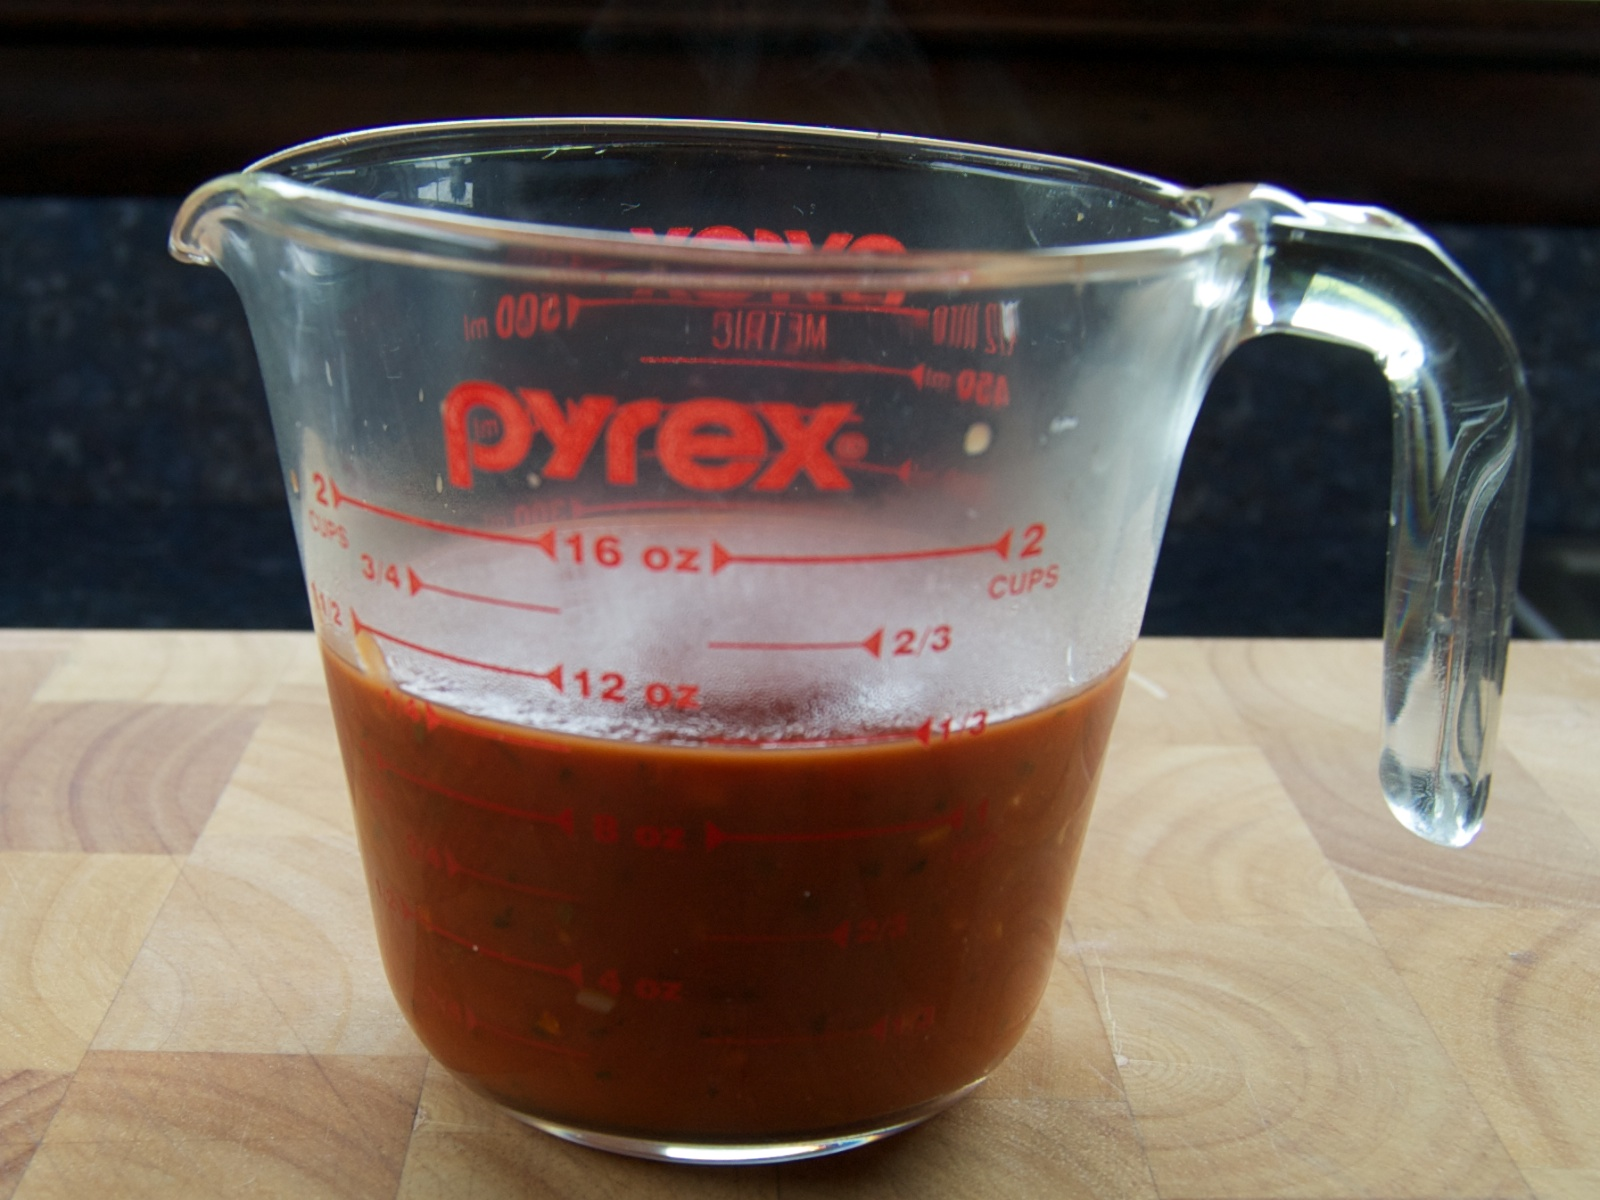 http://blog.rickk.com/food/2011/07/08/ate.2011.07.08.c3.jpg